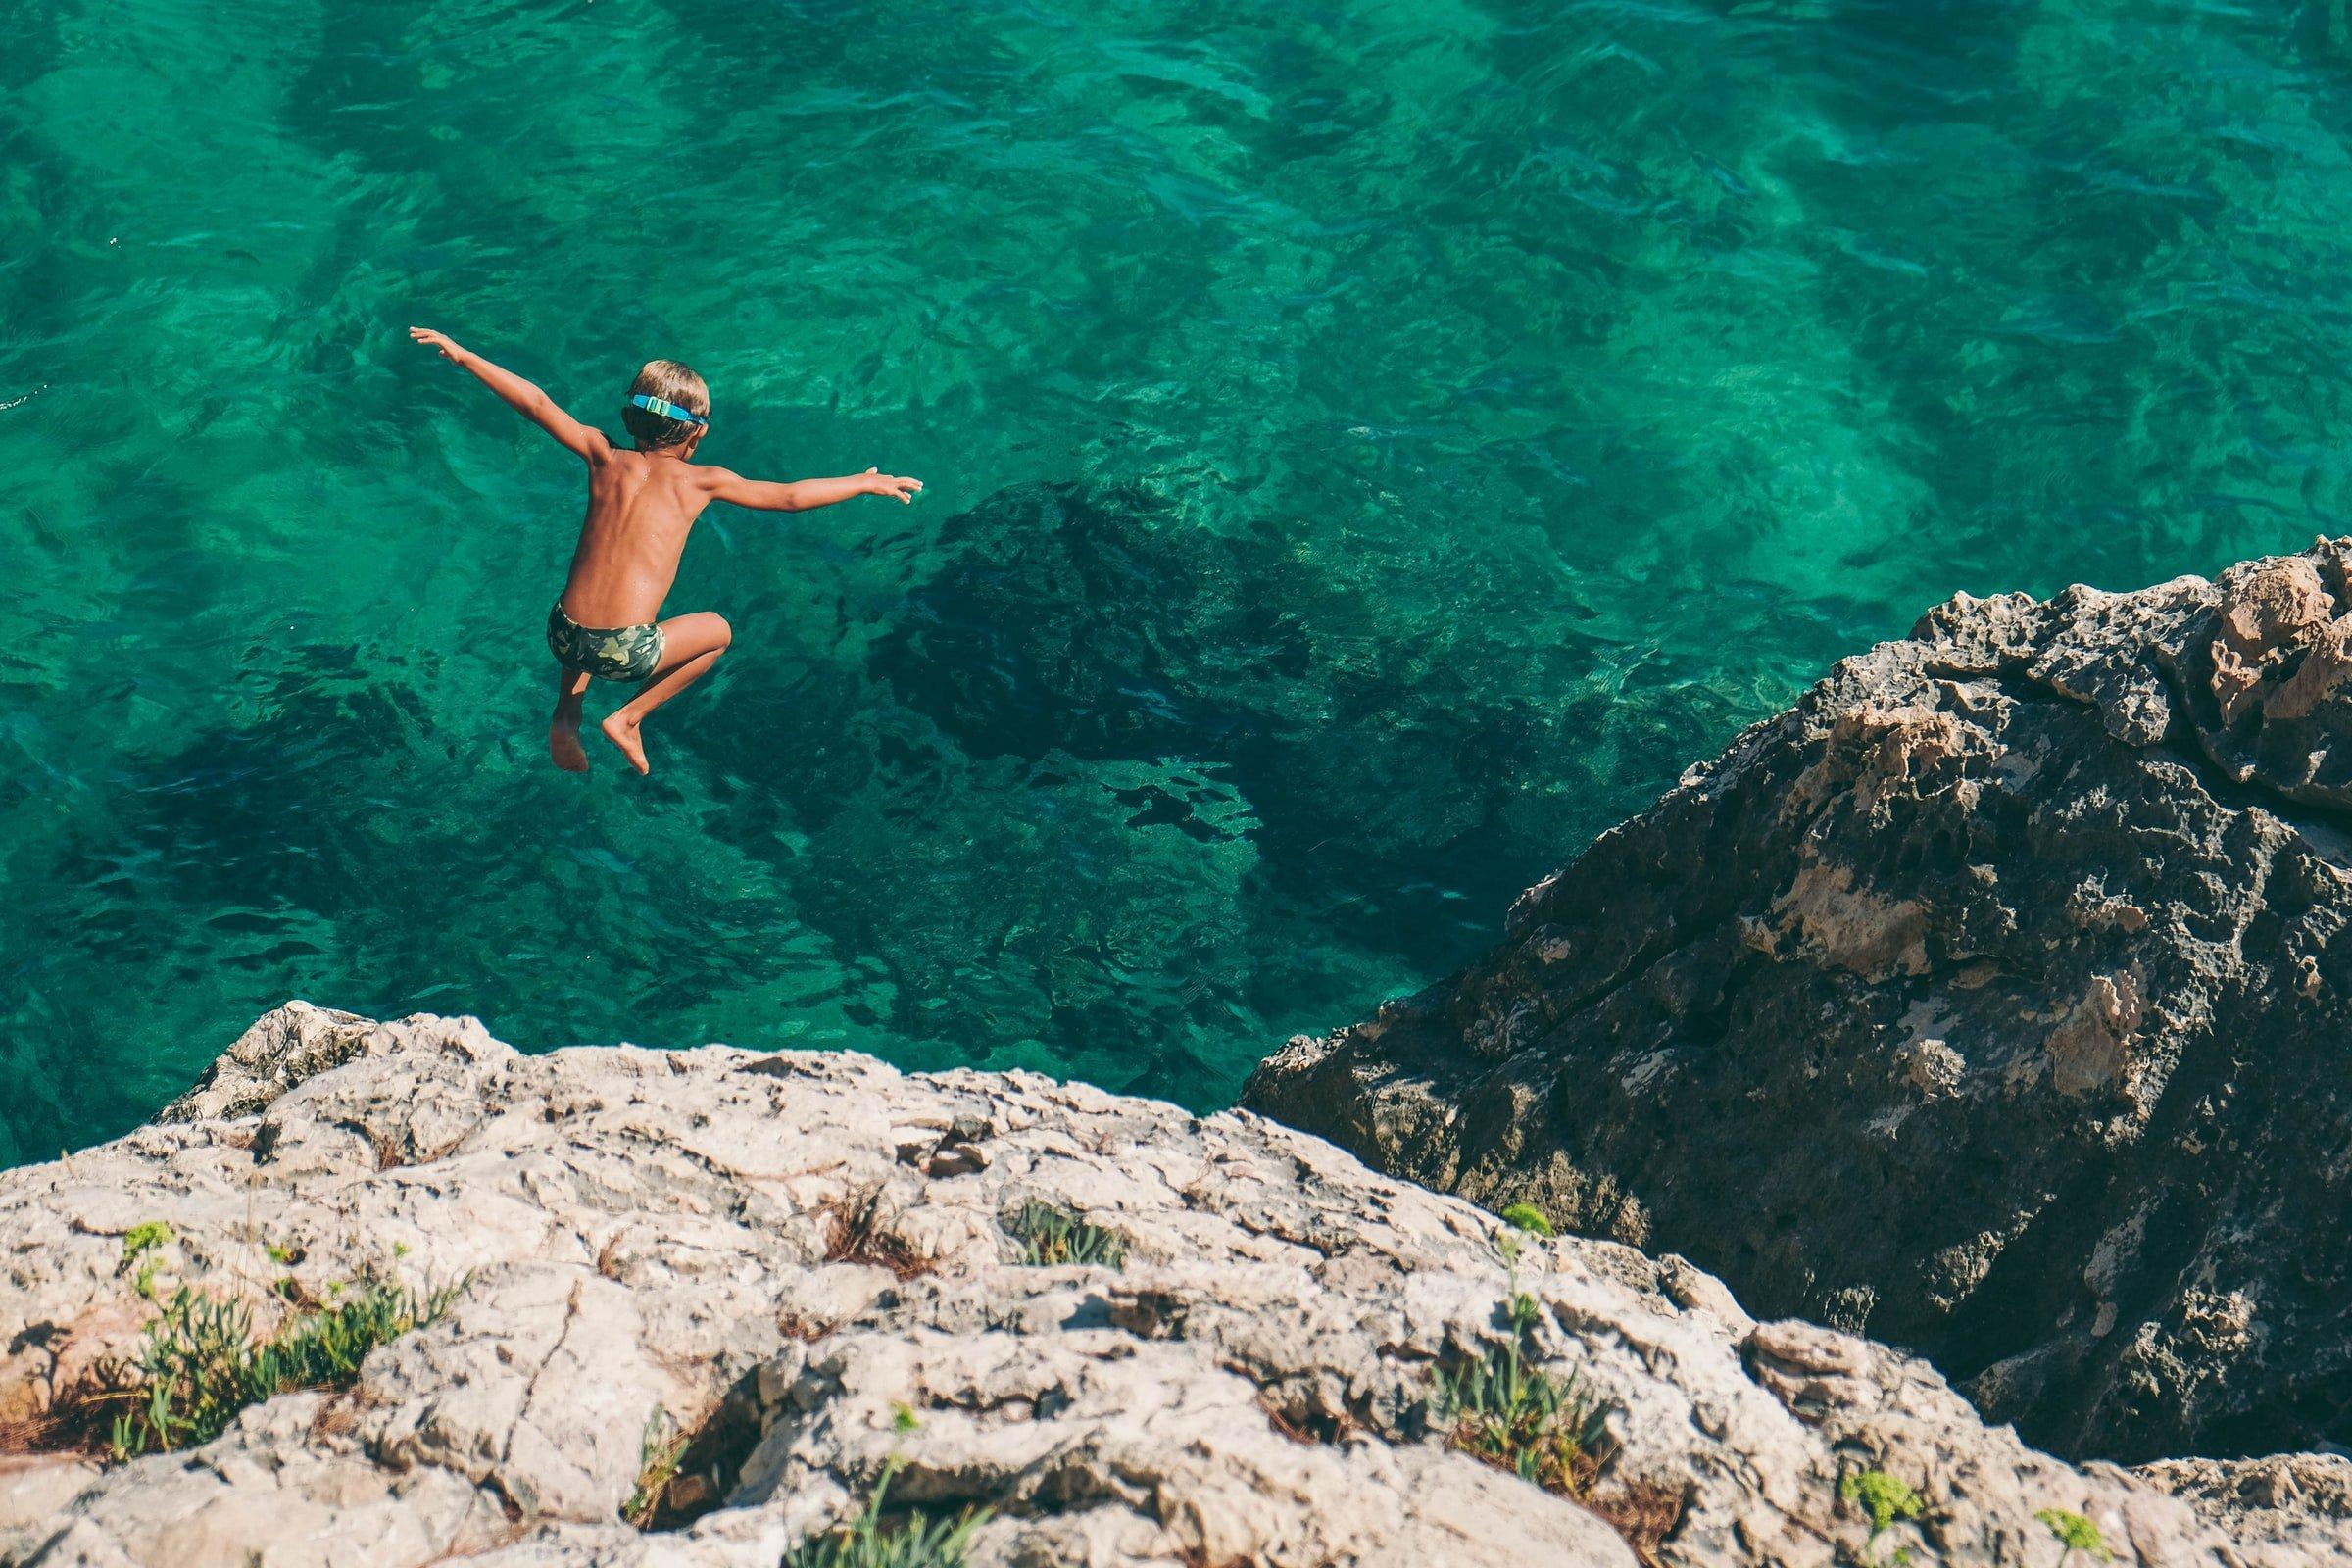 Hvar waters (photo: Nikola Radojcic)